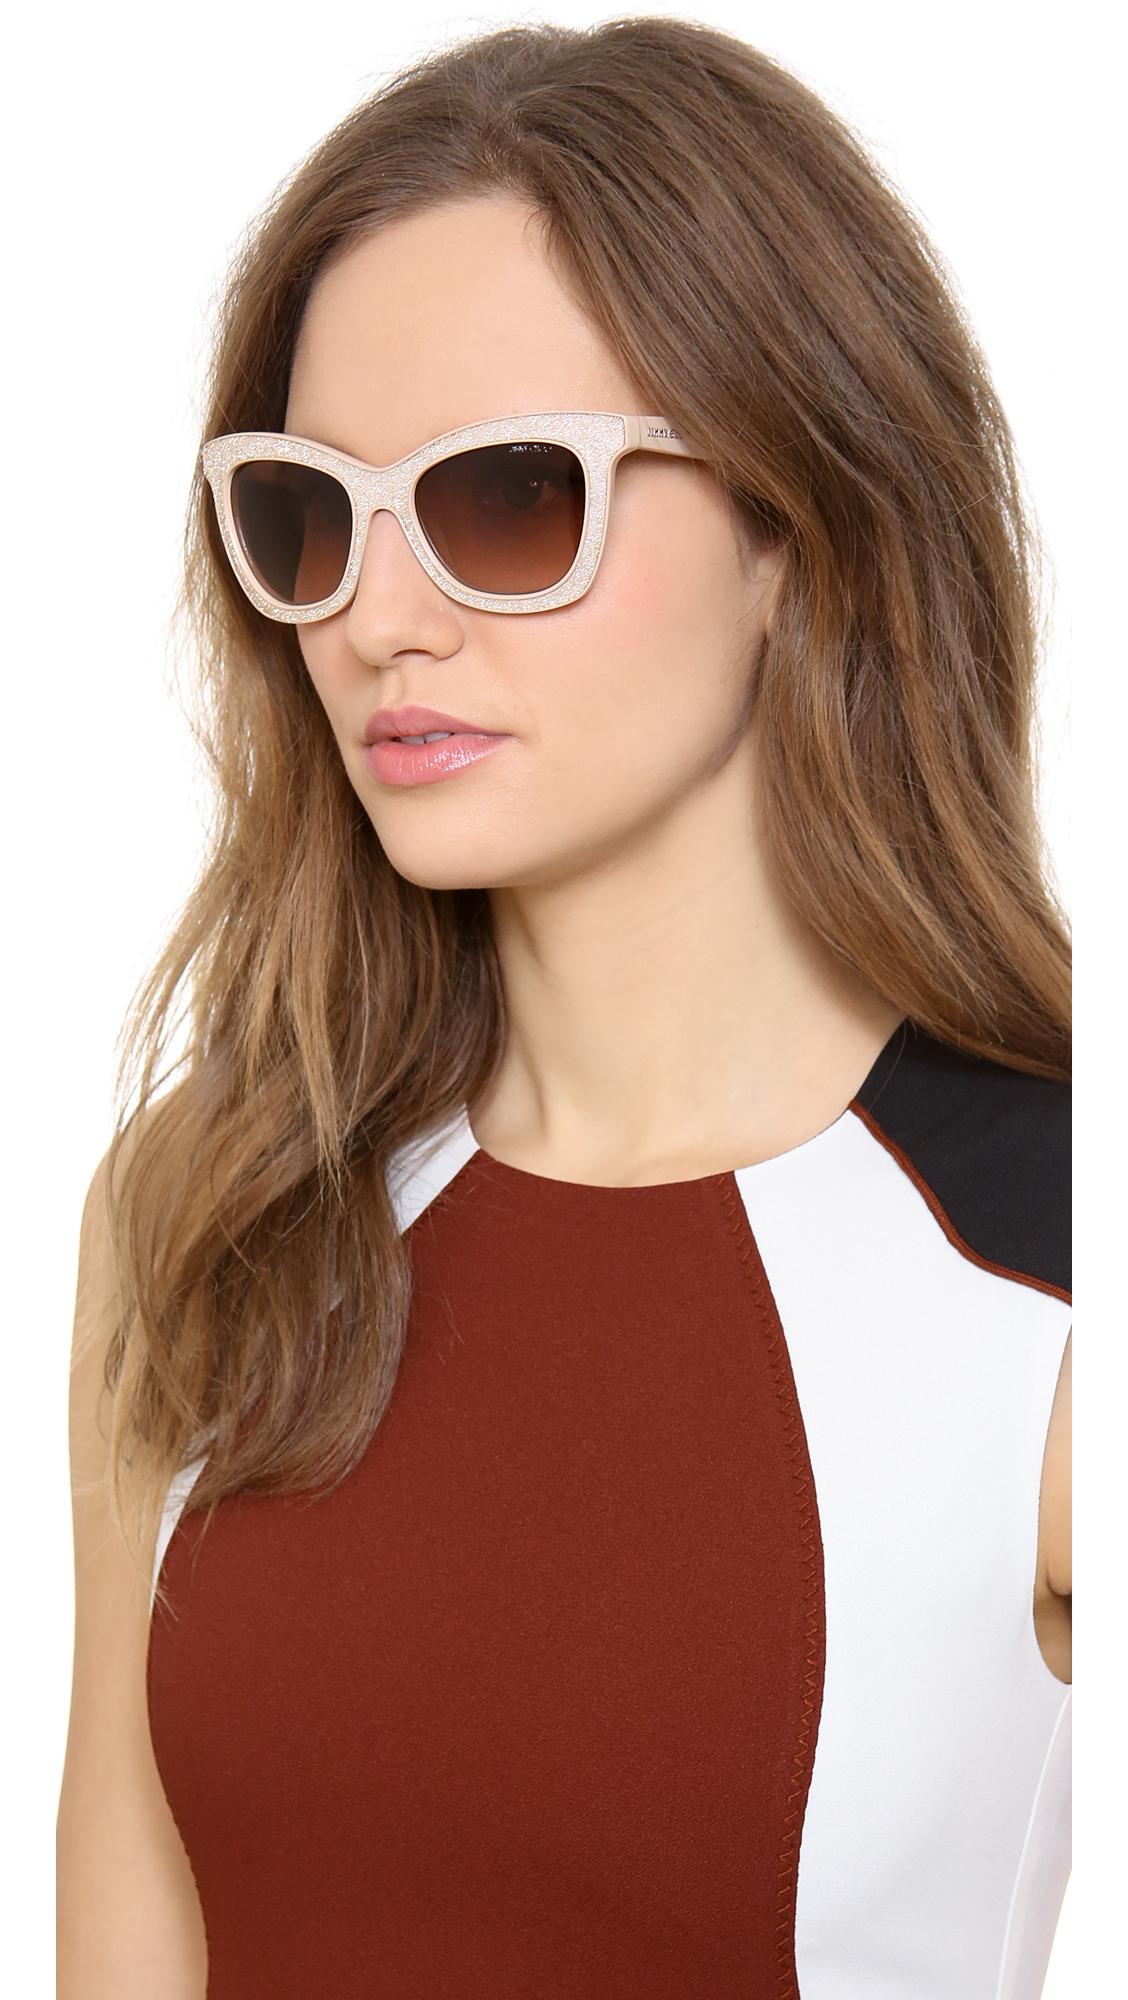 ab8498a9f6e Jimmy Choo Flash Sunglasses